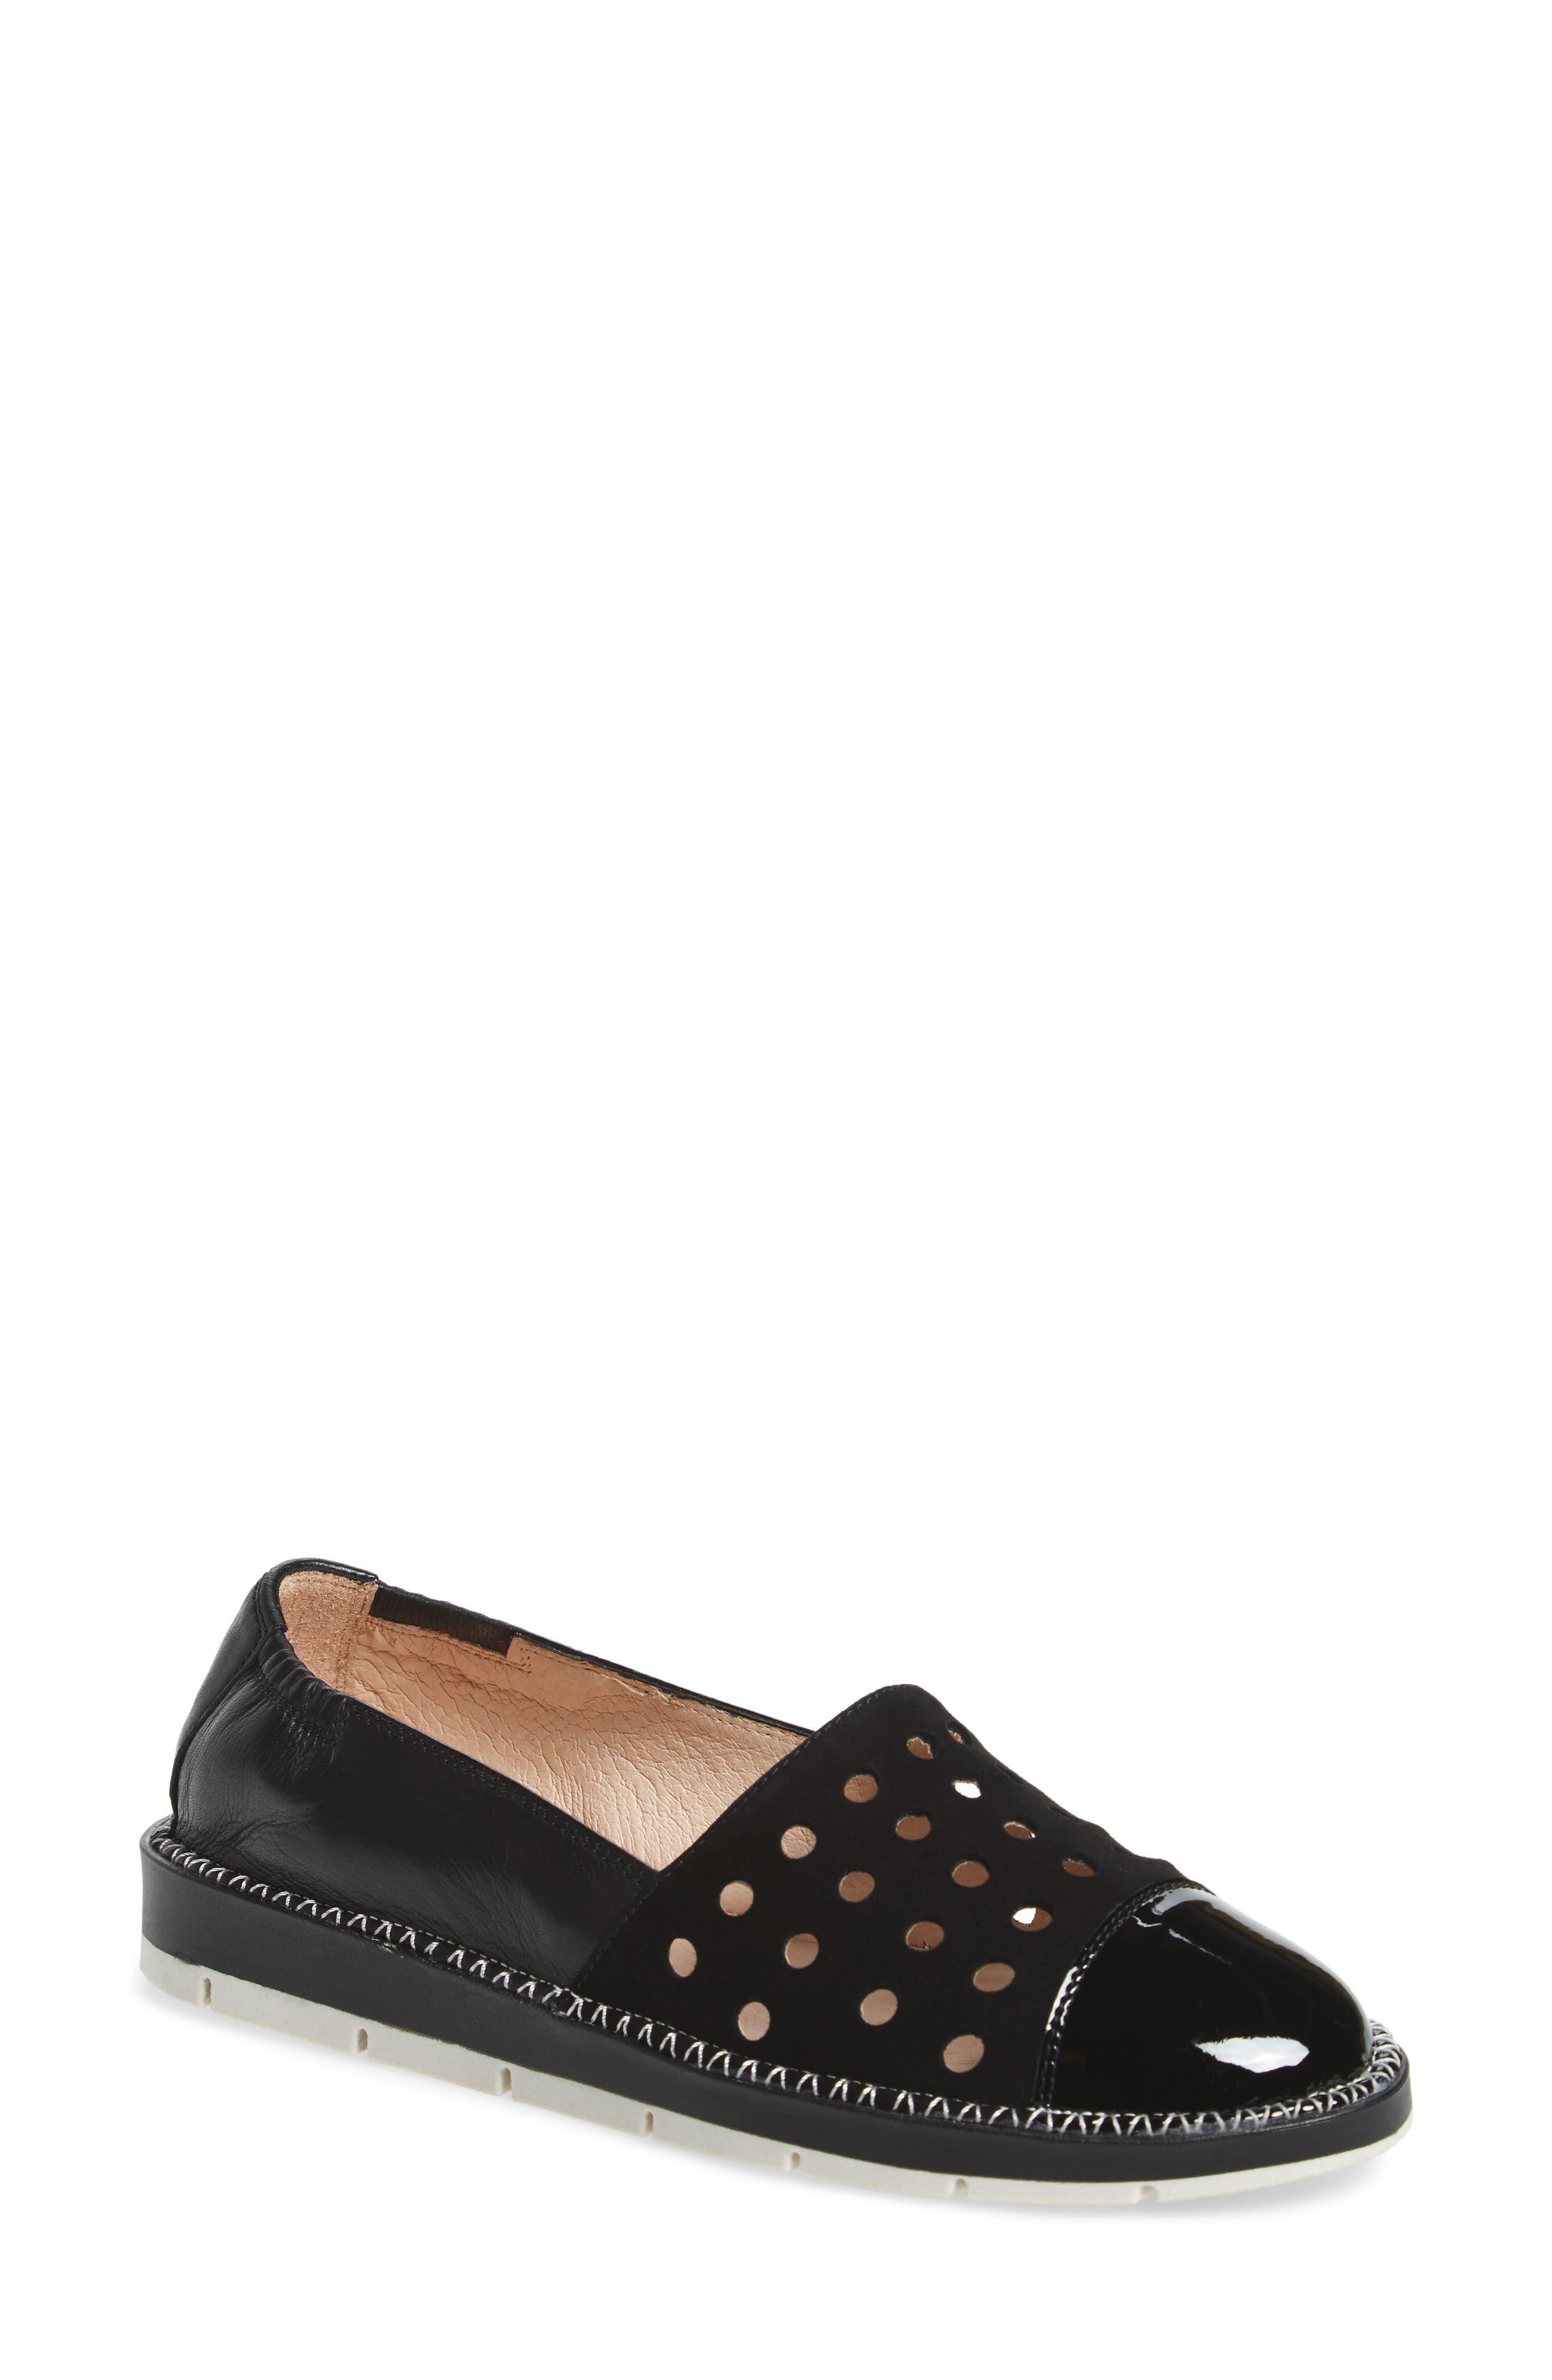 Maiko Flat,                         Main,                         color, Kaffir Black Leather